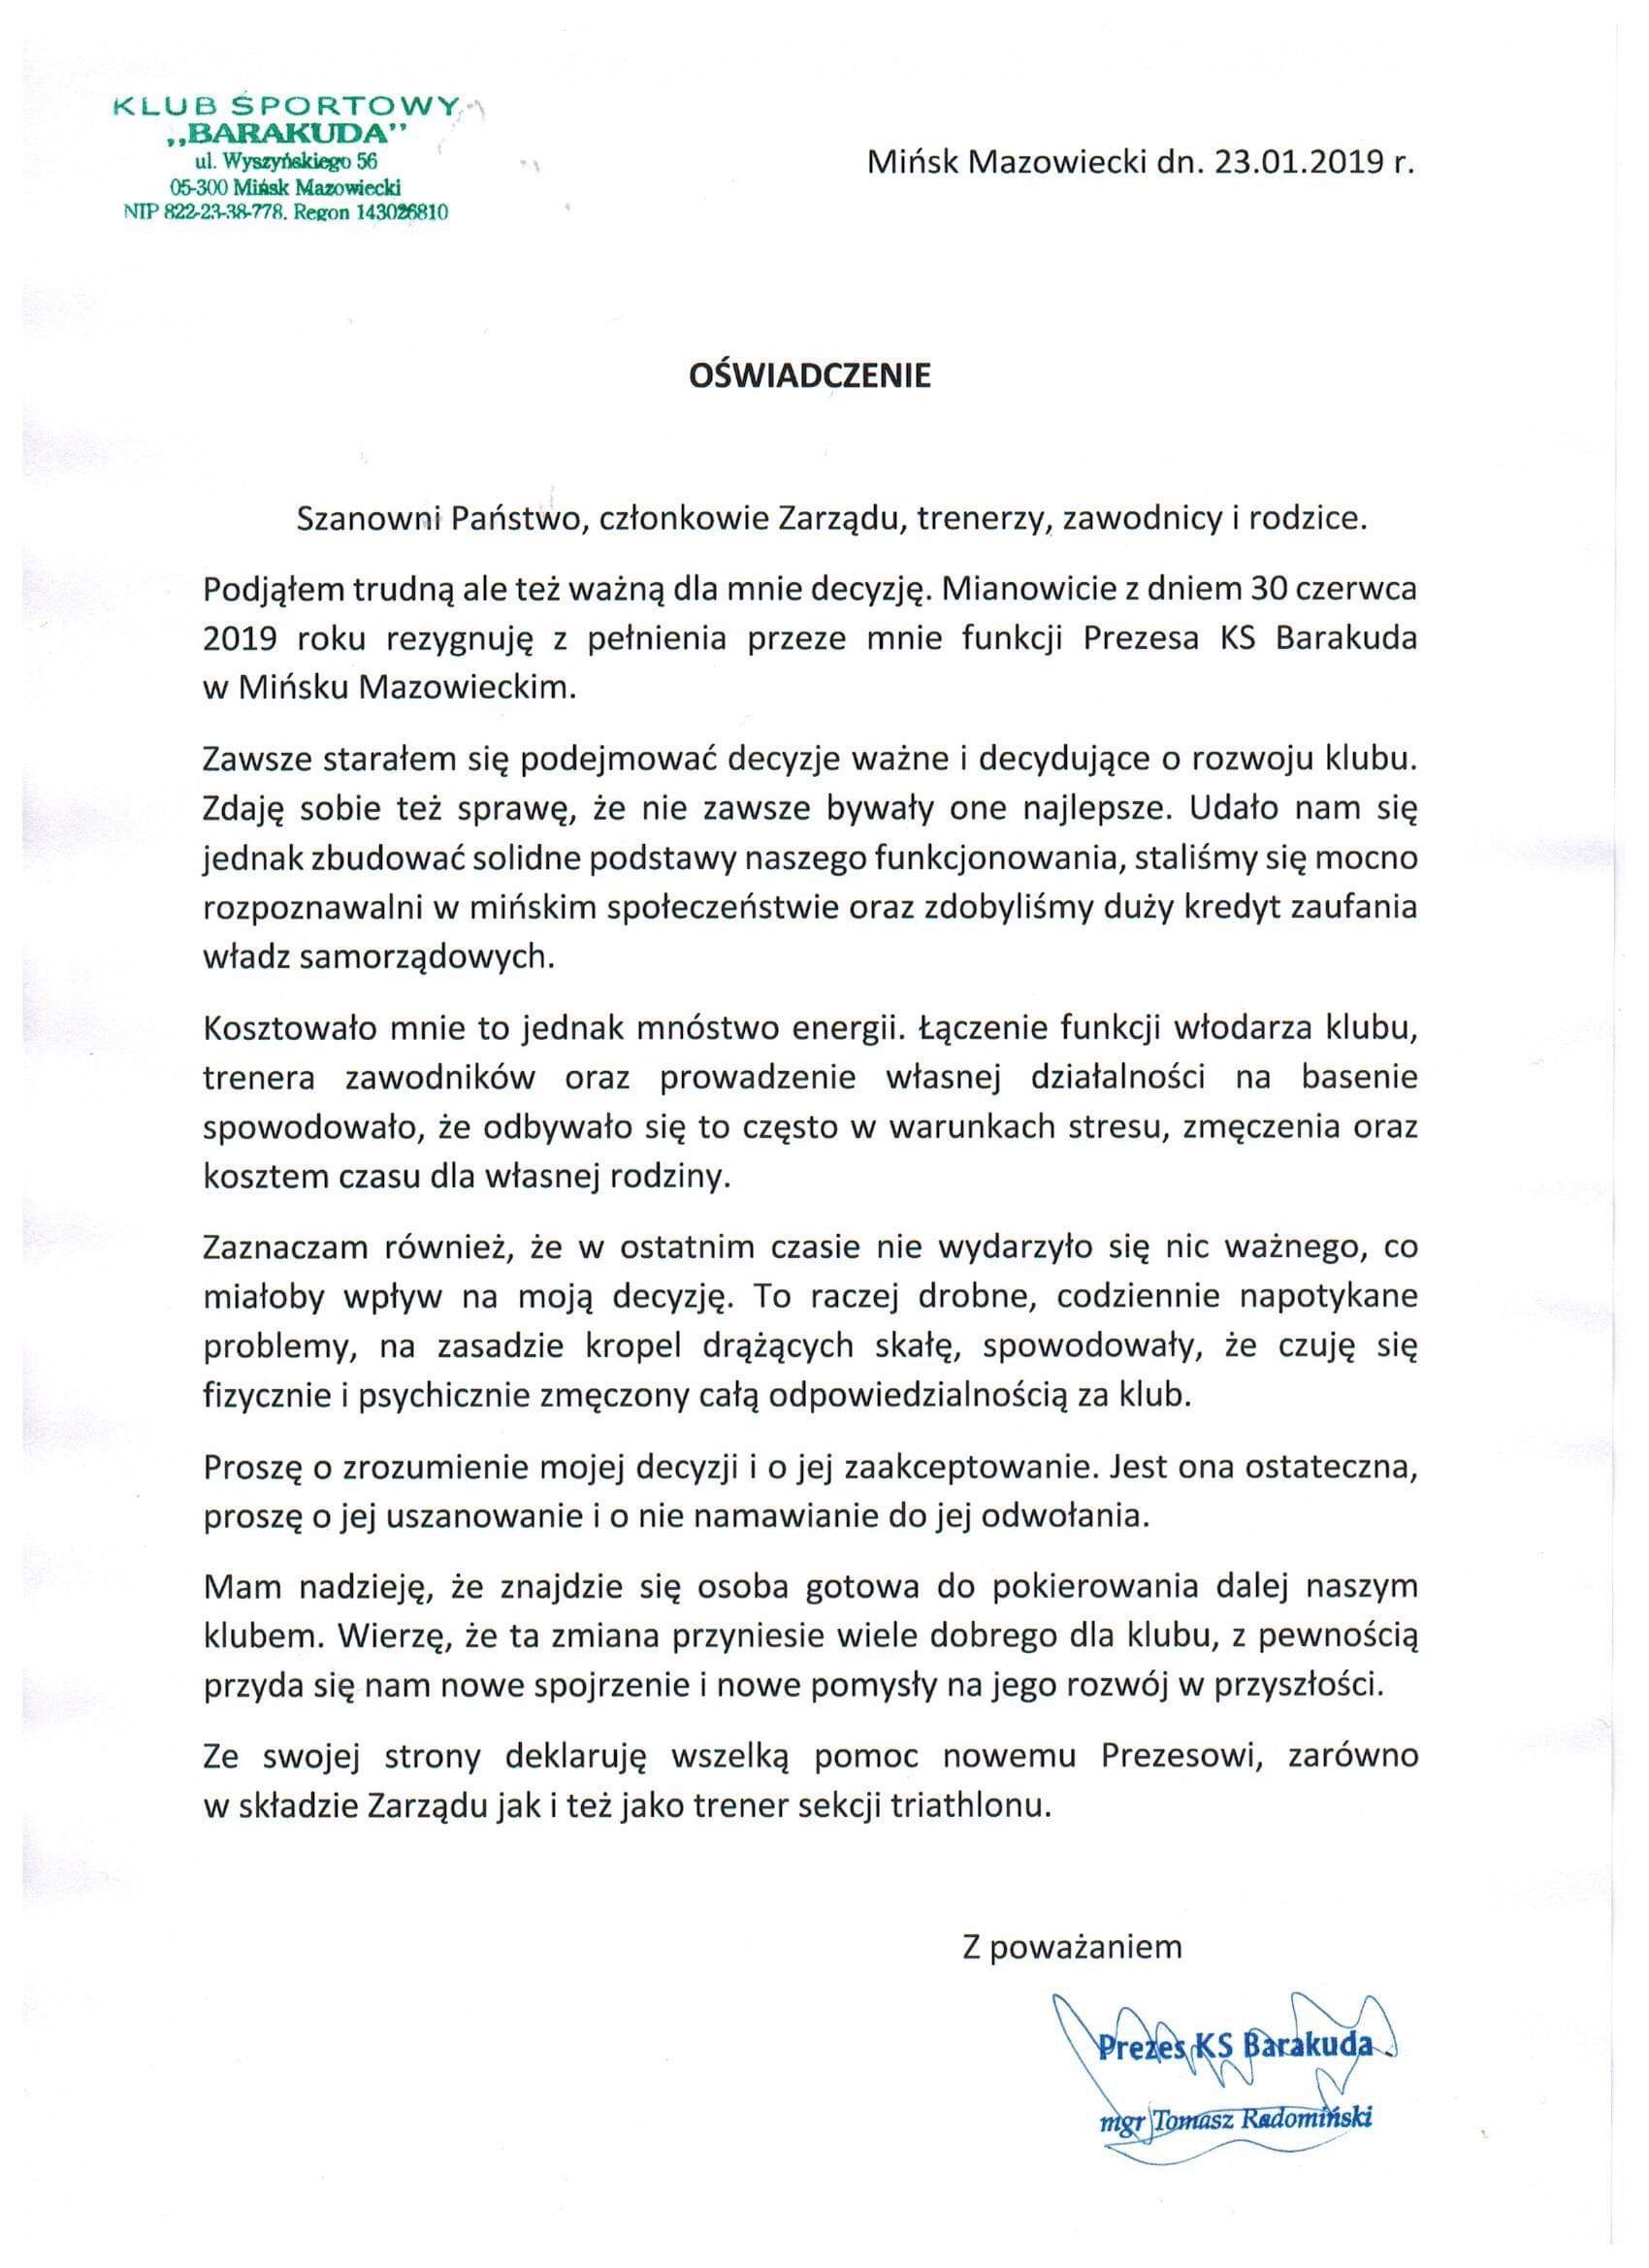 http://www.barakuda.net.pl/wp-content/uploads/2019/01/rezygnacjaa.jpg